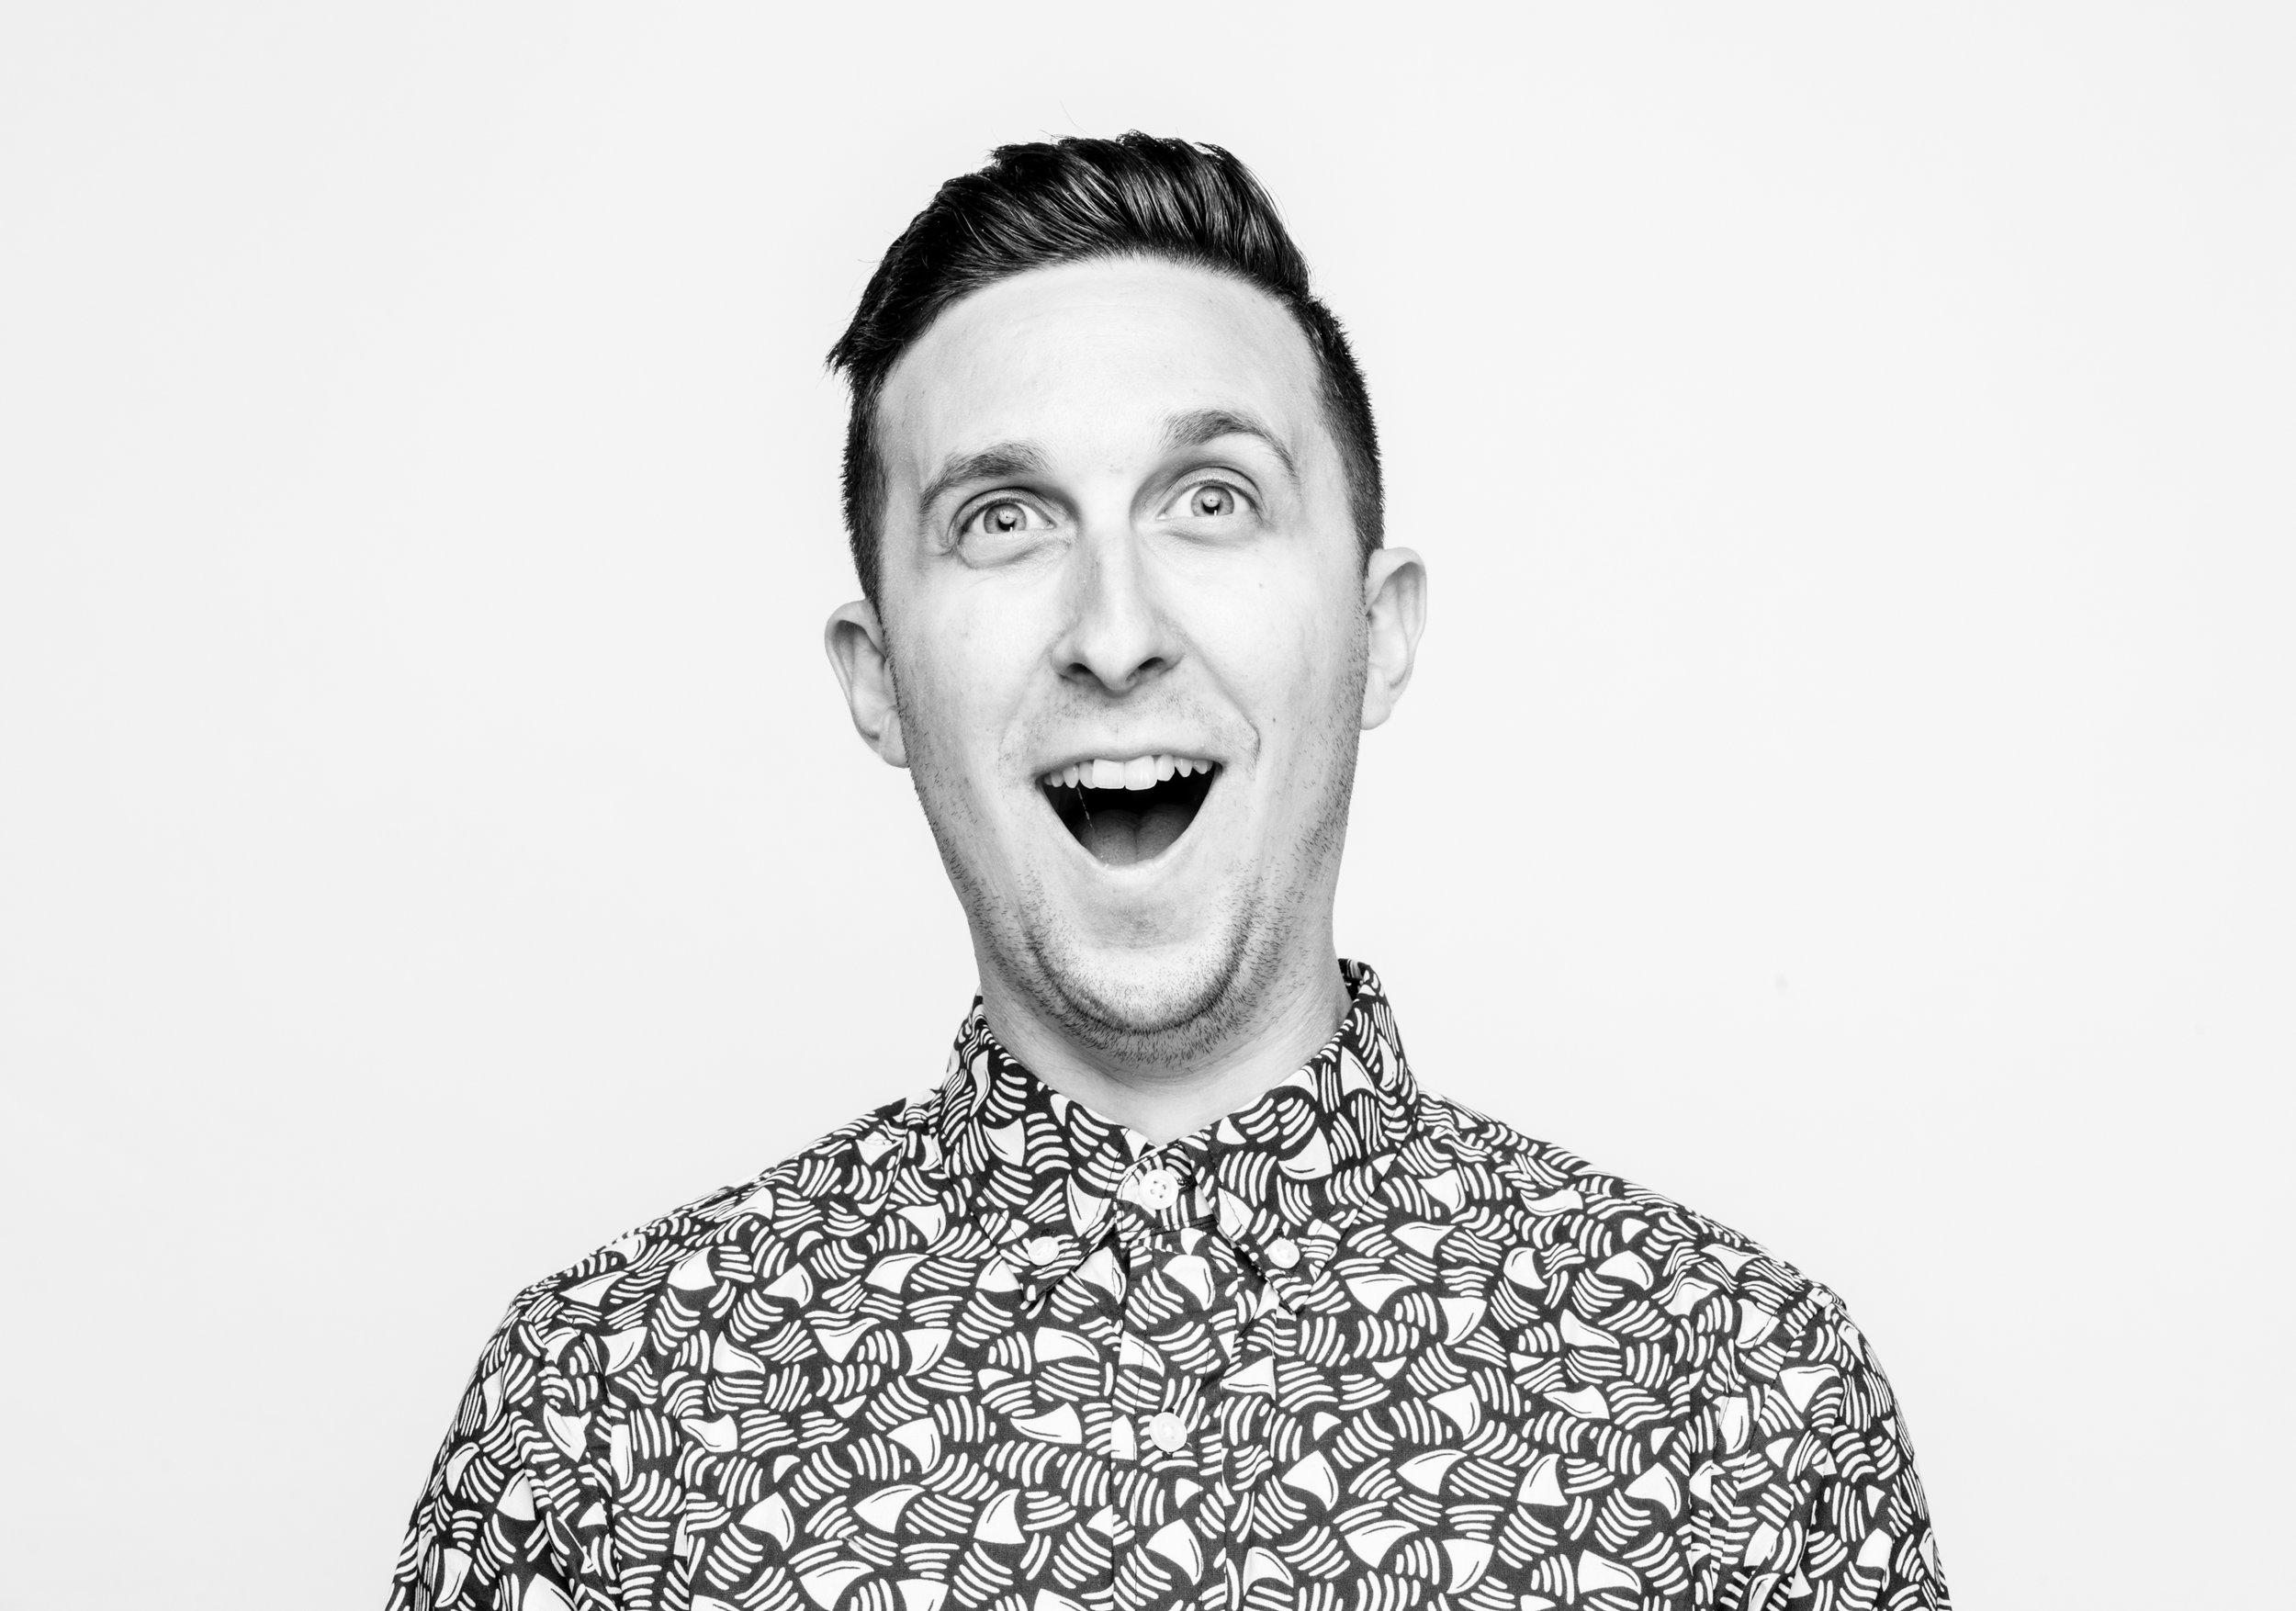 Ecstatic smile of man on white background